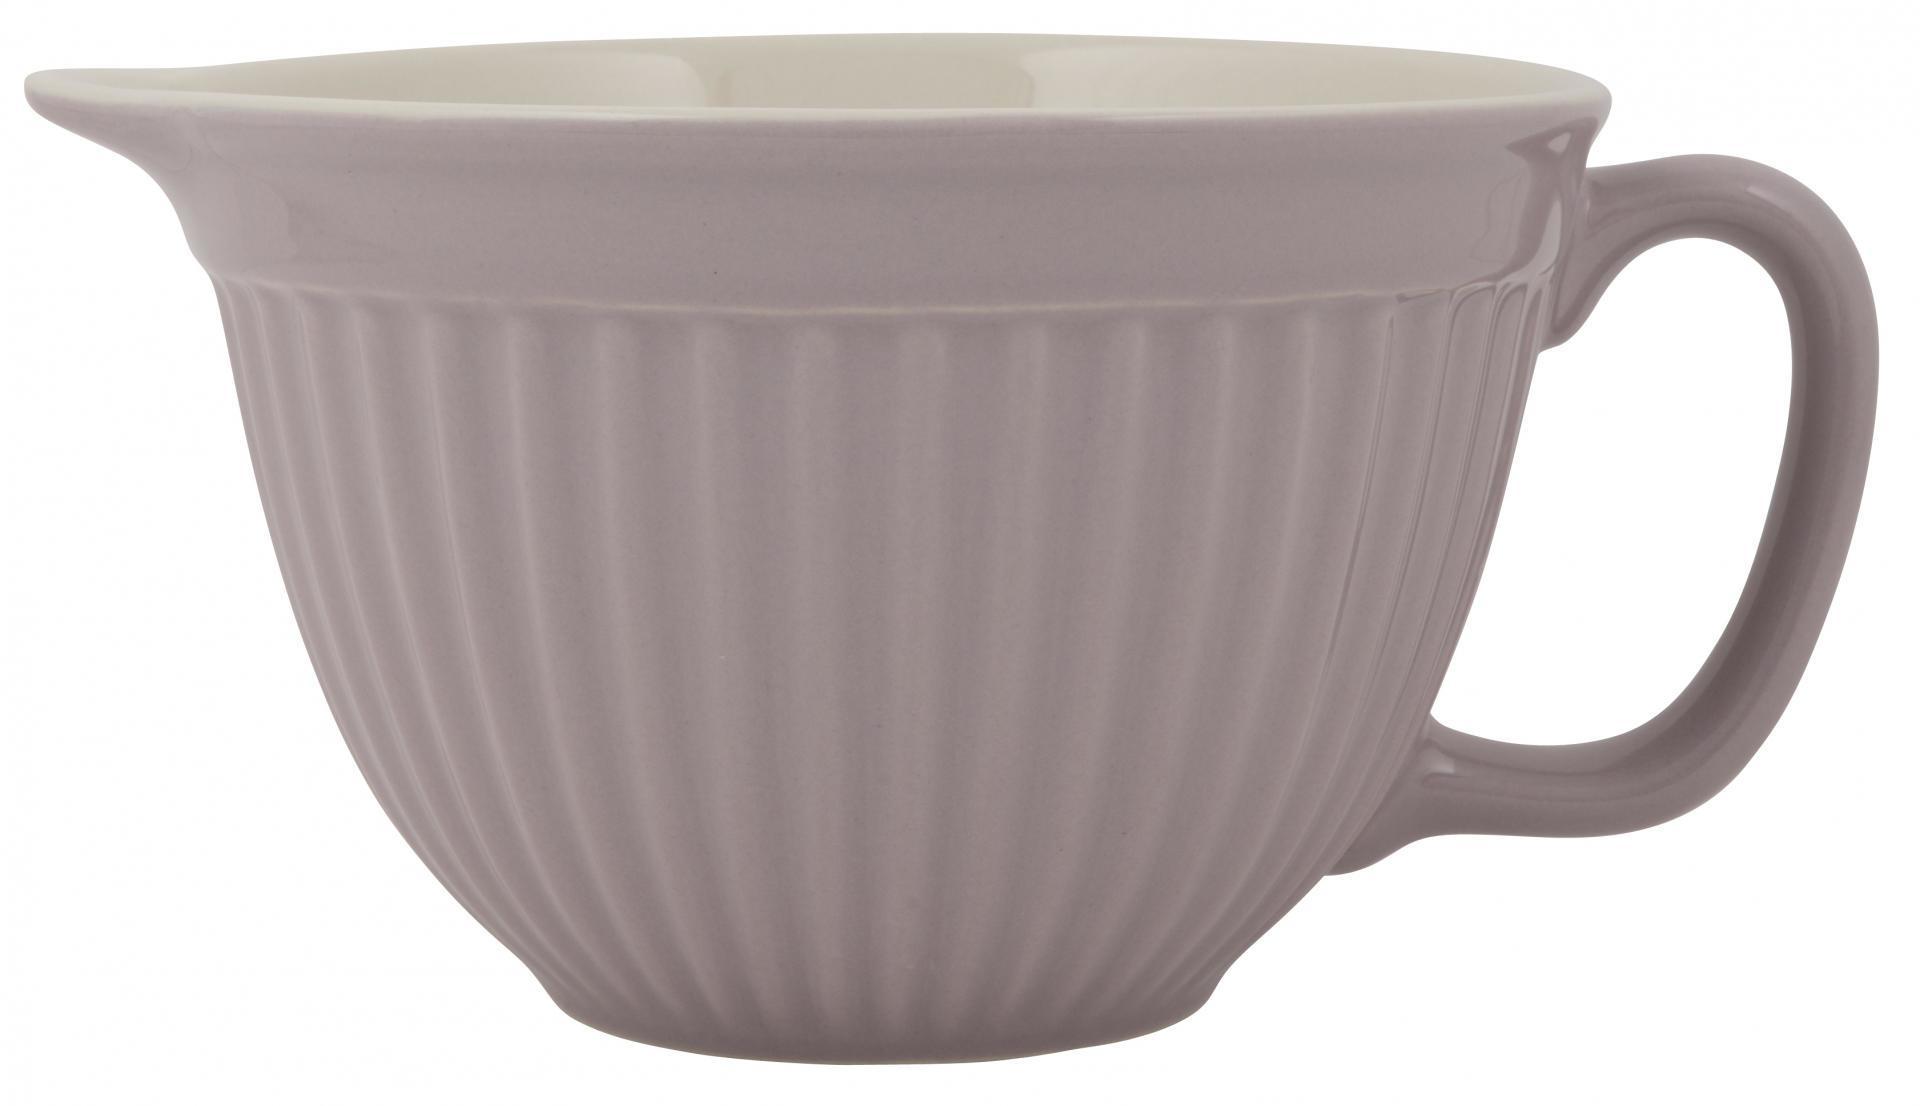 IB LAURSEN Mísa na těsto Mynte Lavender haze, fialová barva, keramika